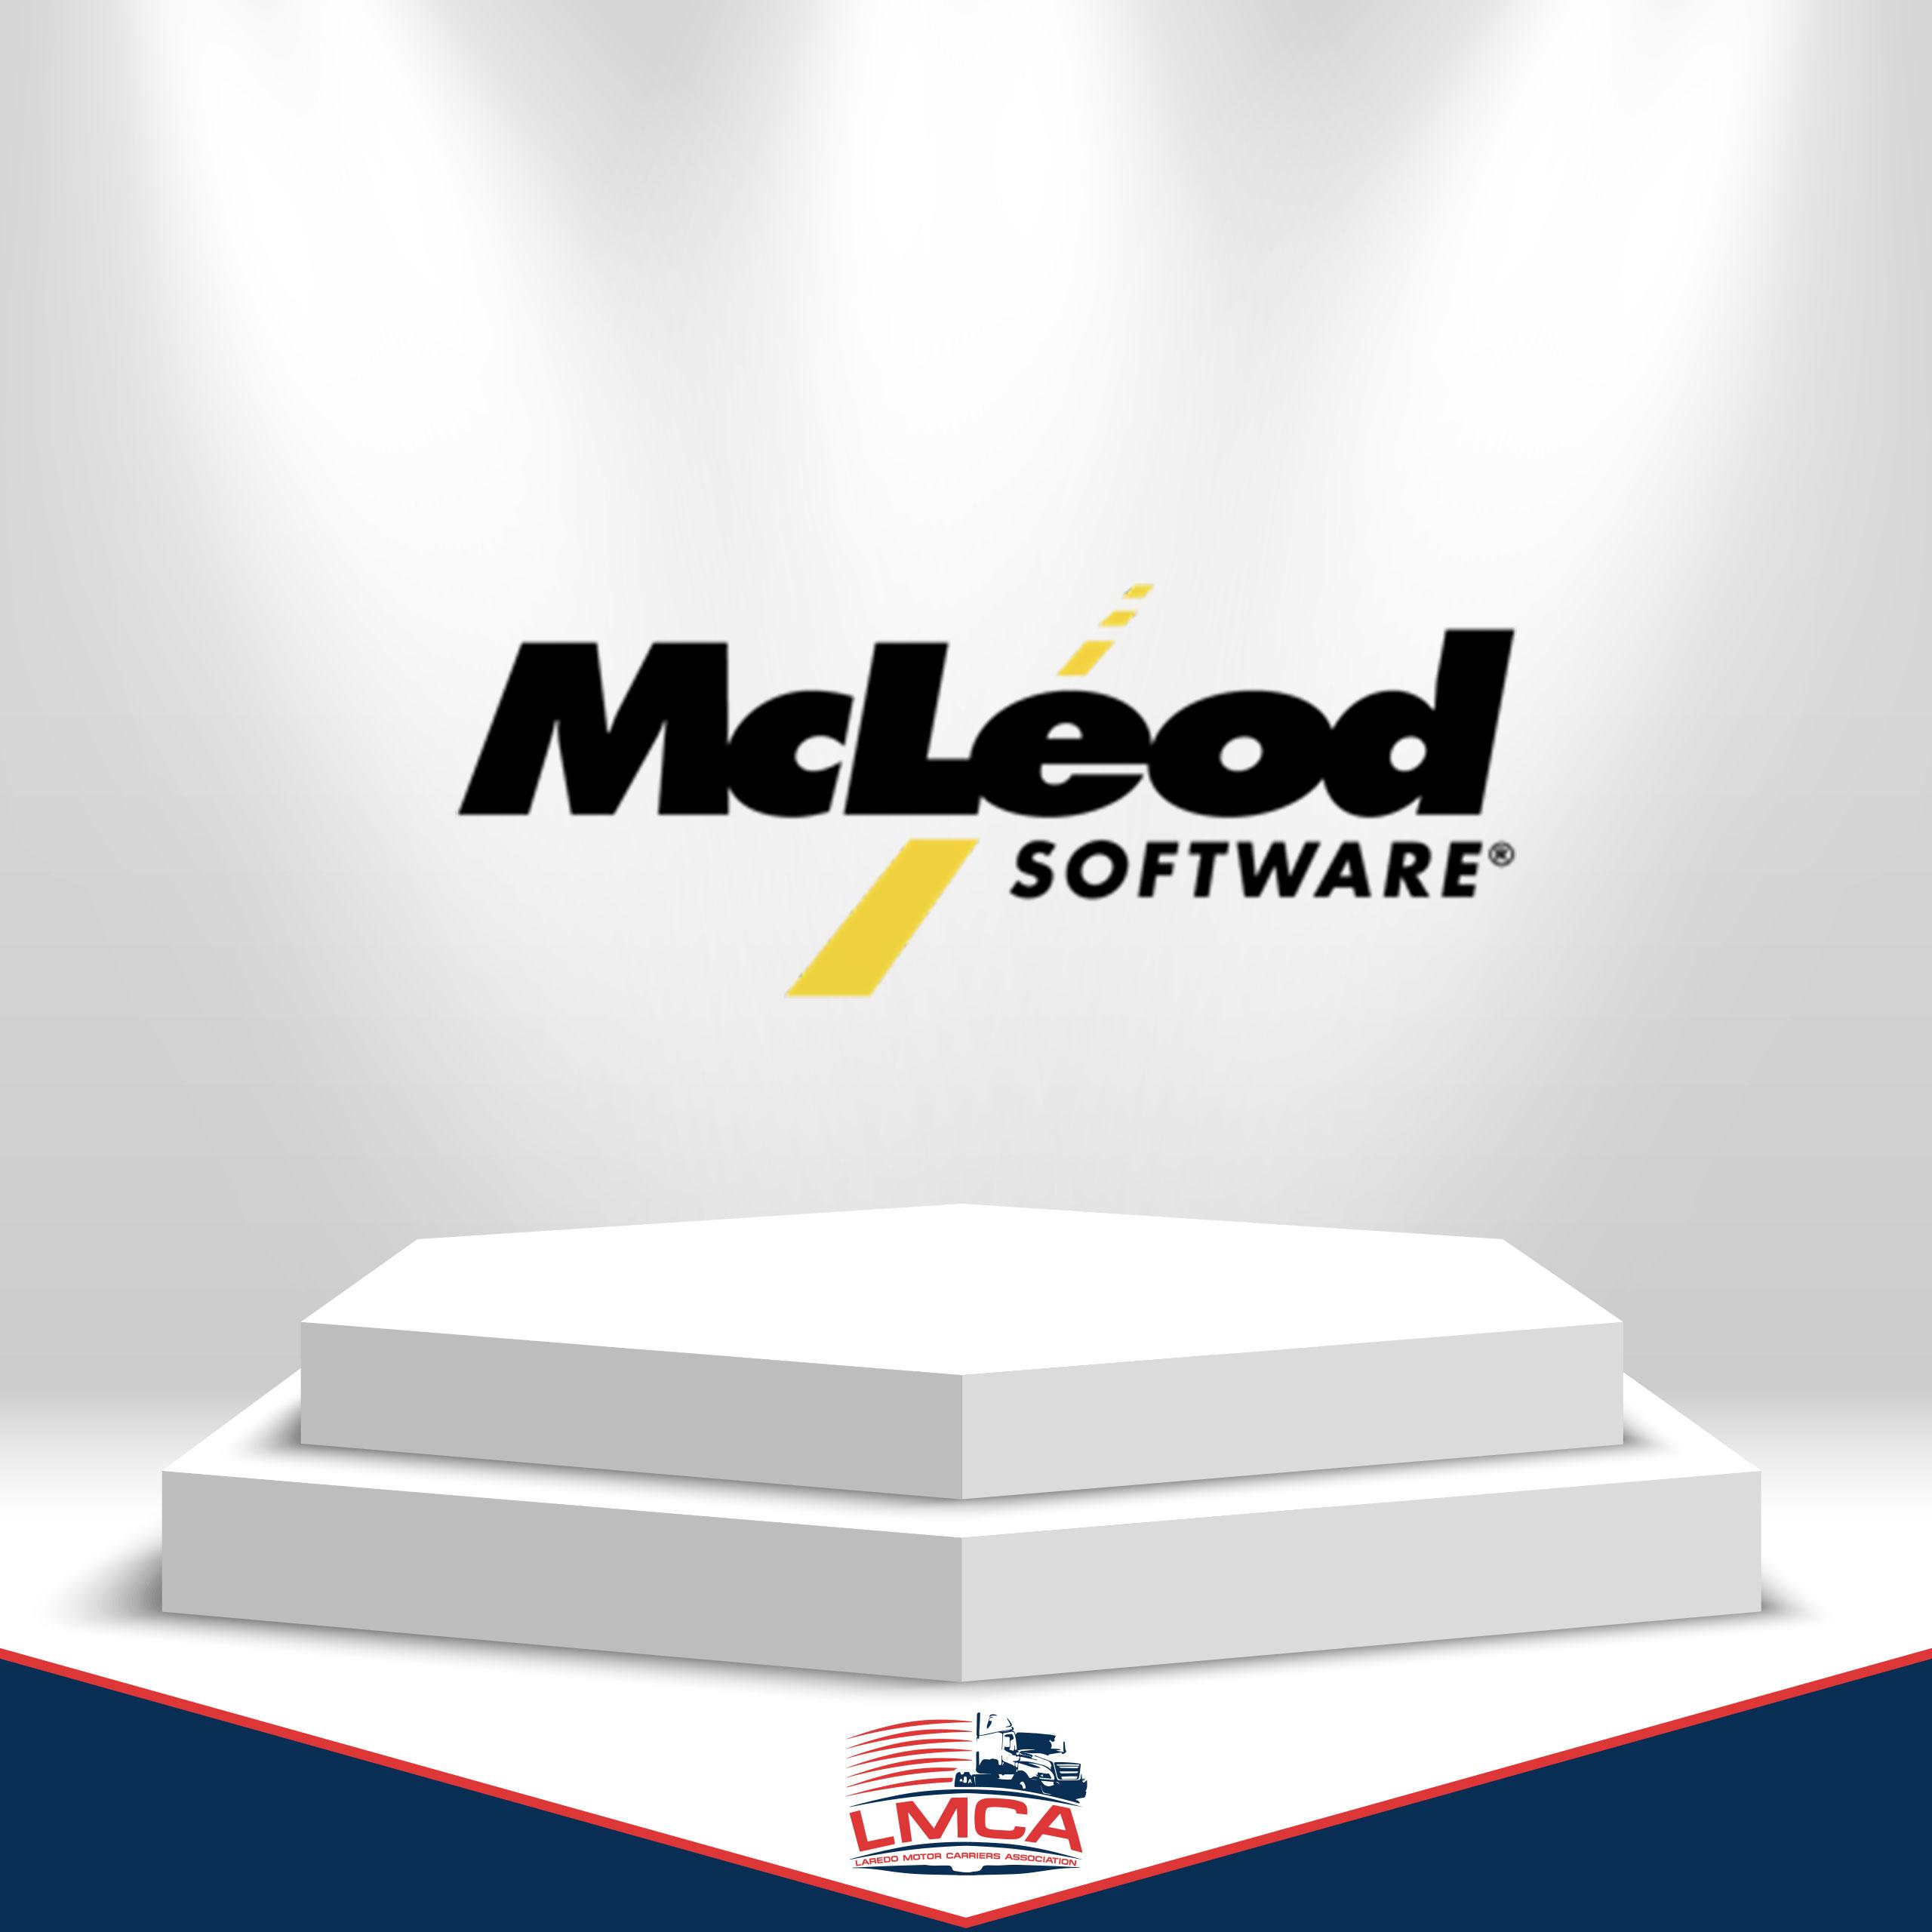 mcleod-lmca